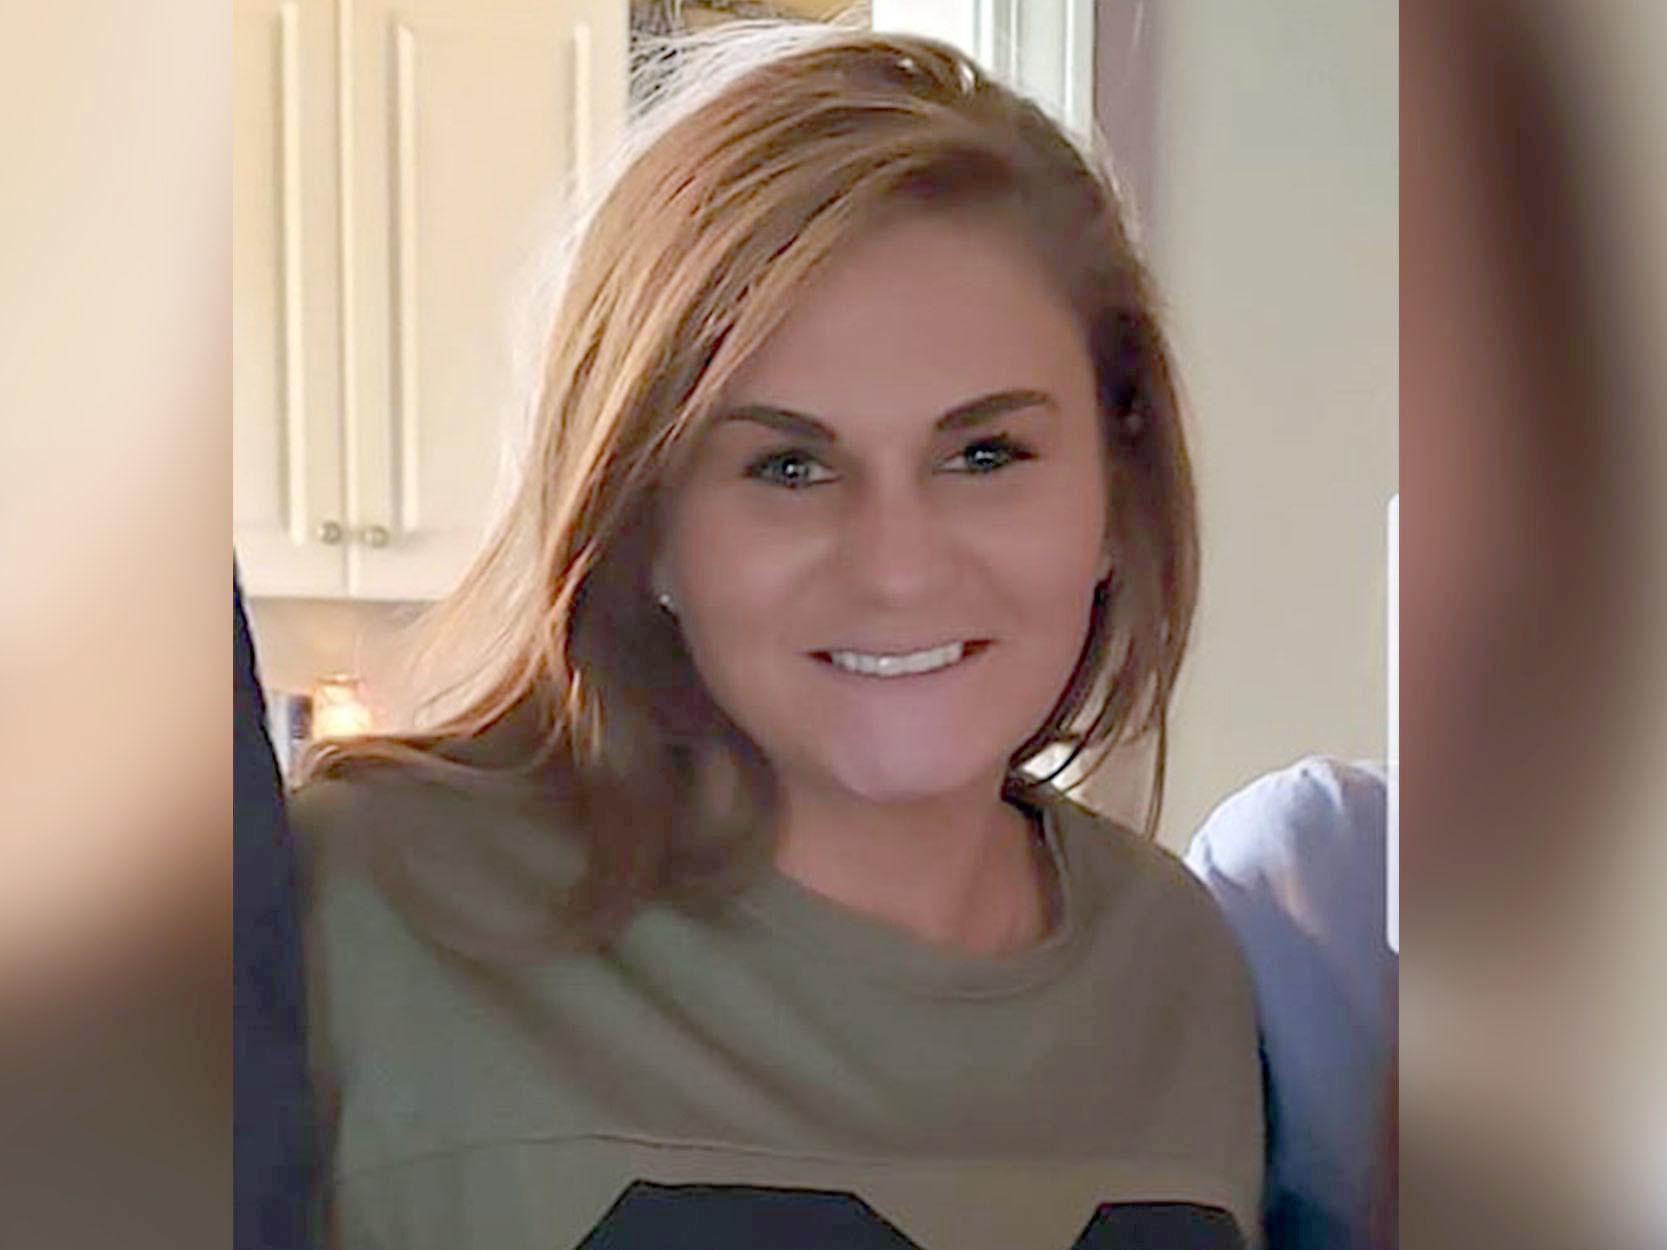 $5K reward offered for information on missing Alabama woman last seen leaving bar